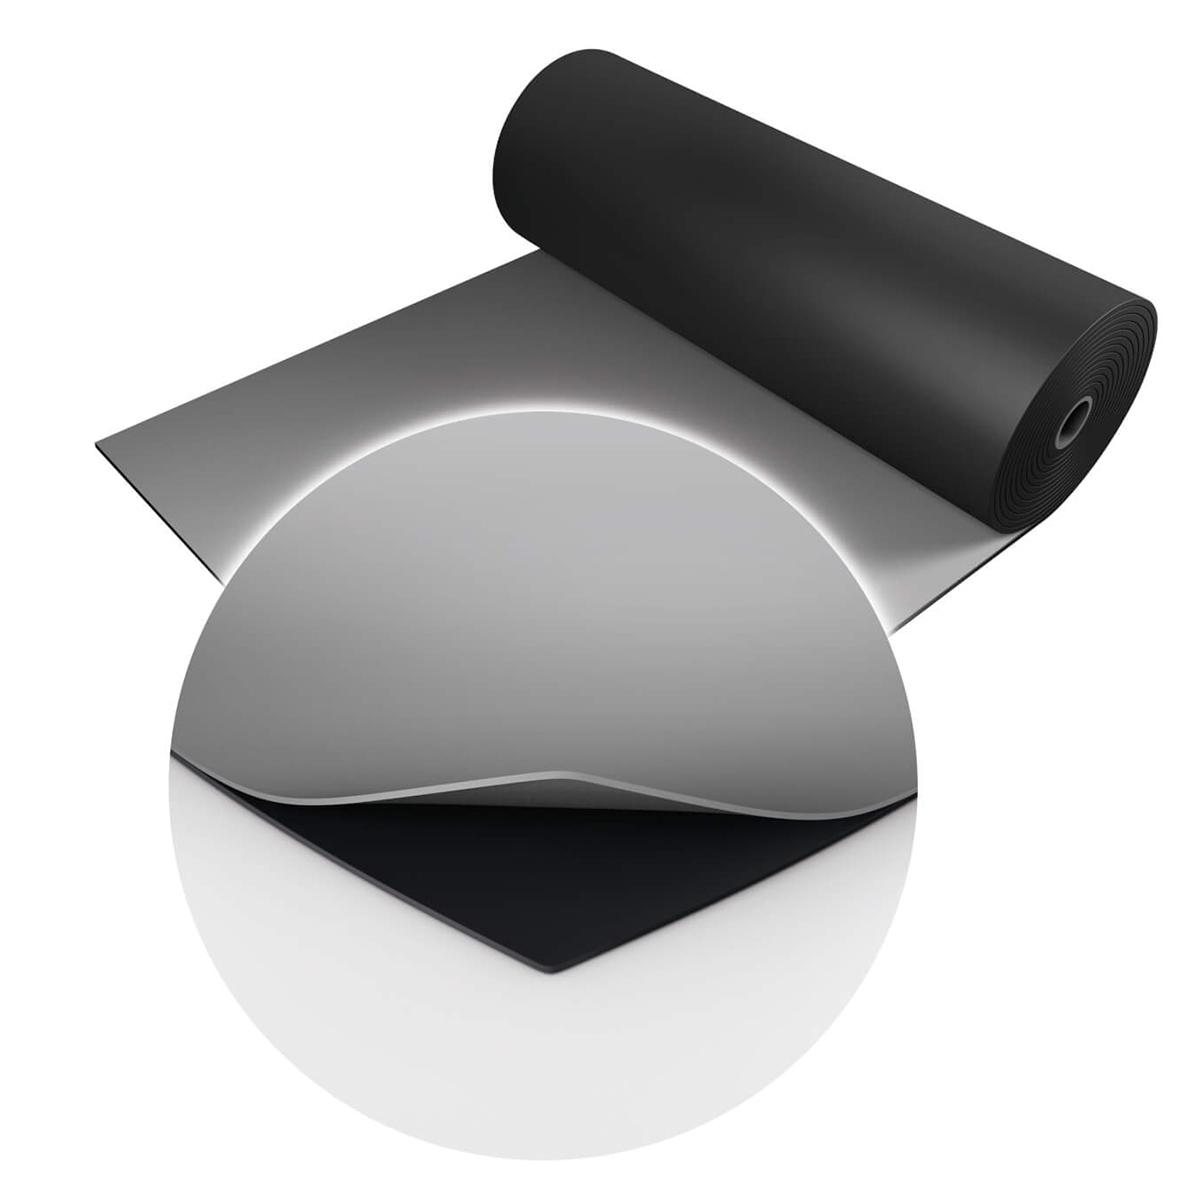 Two Stage dubbelzijdige dansvloer 2m x 10m zwart / grijs